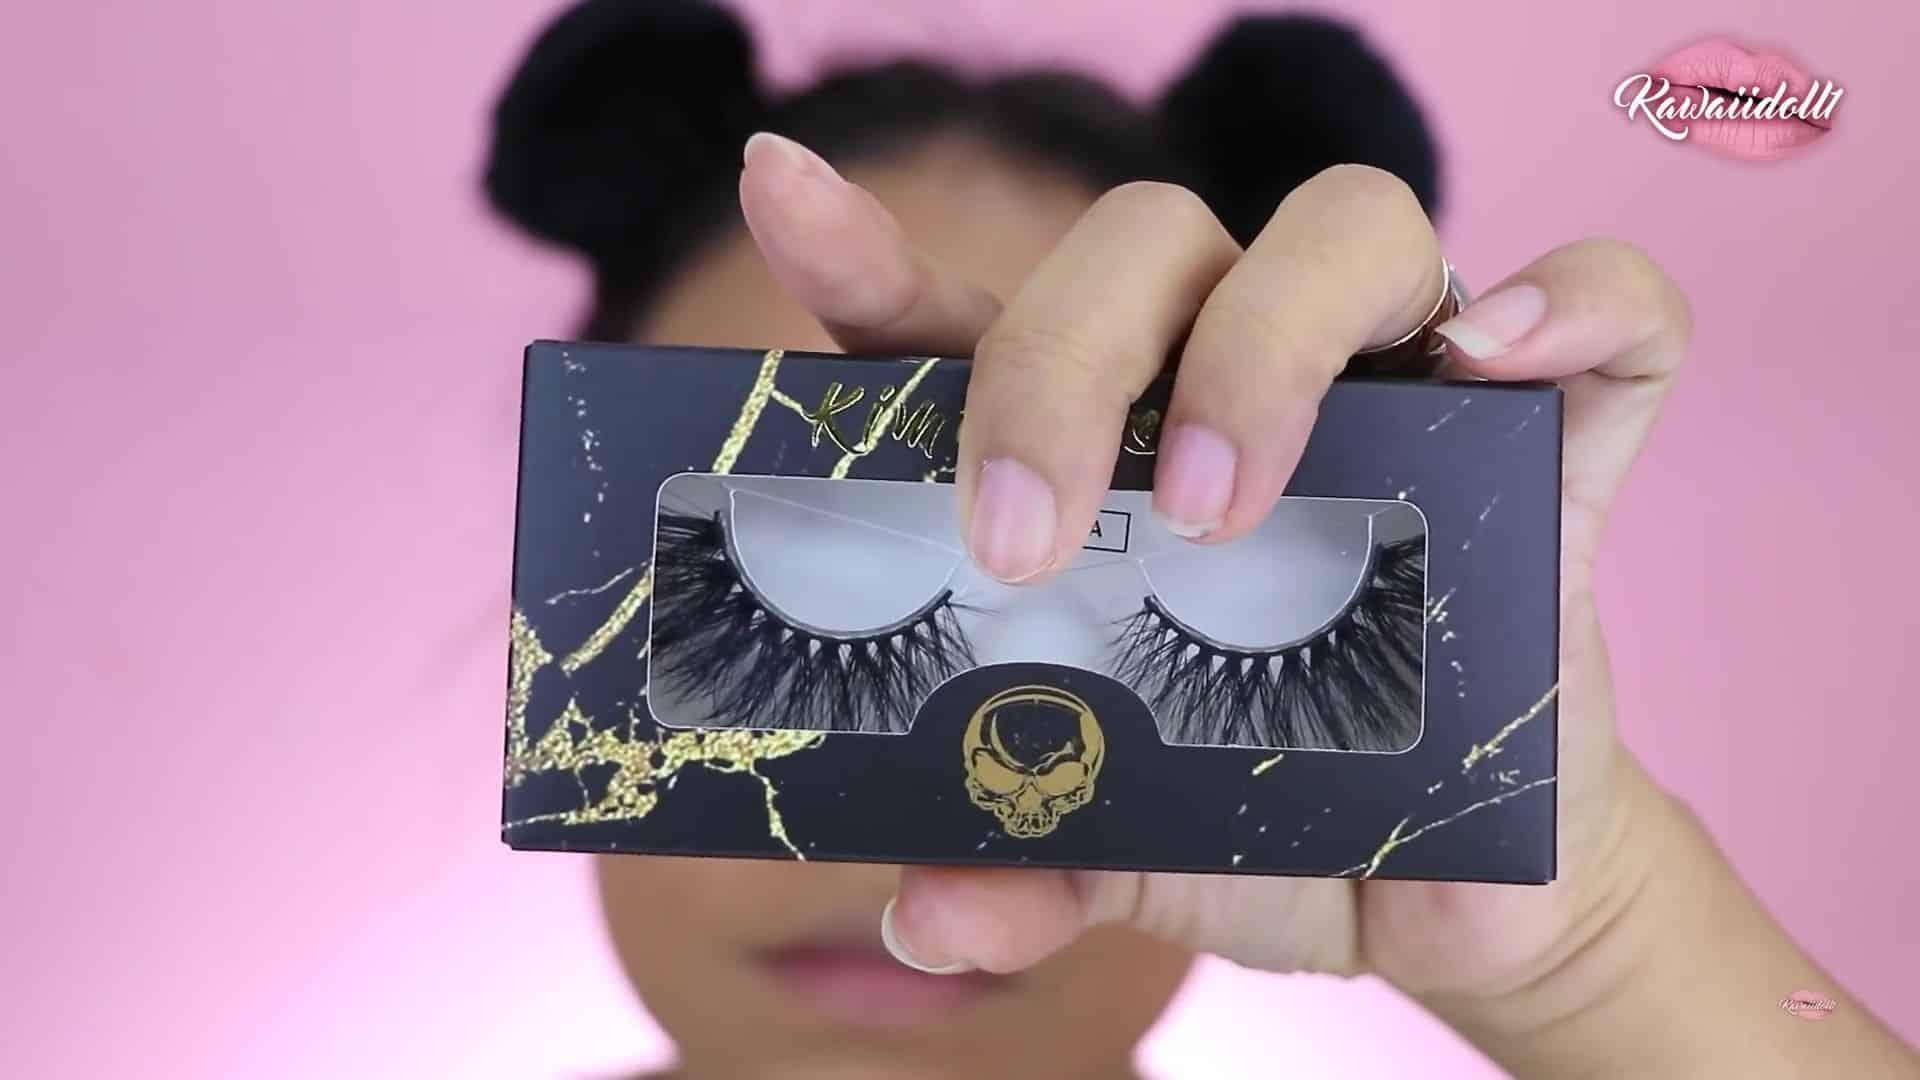 maquillaje de fantasía rapunzel 2020 kawaiidoll1 pestañas postizas.